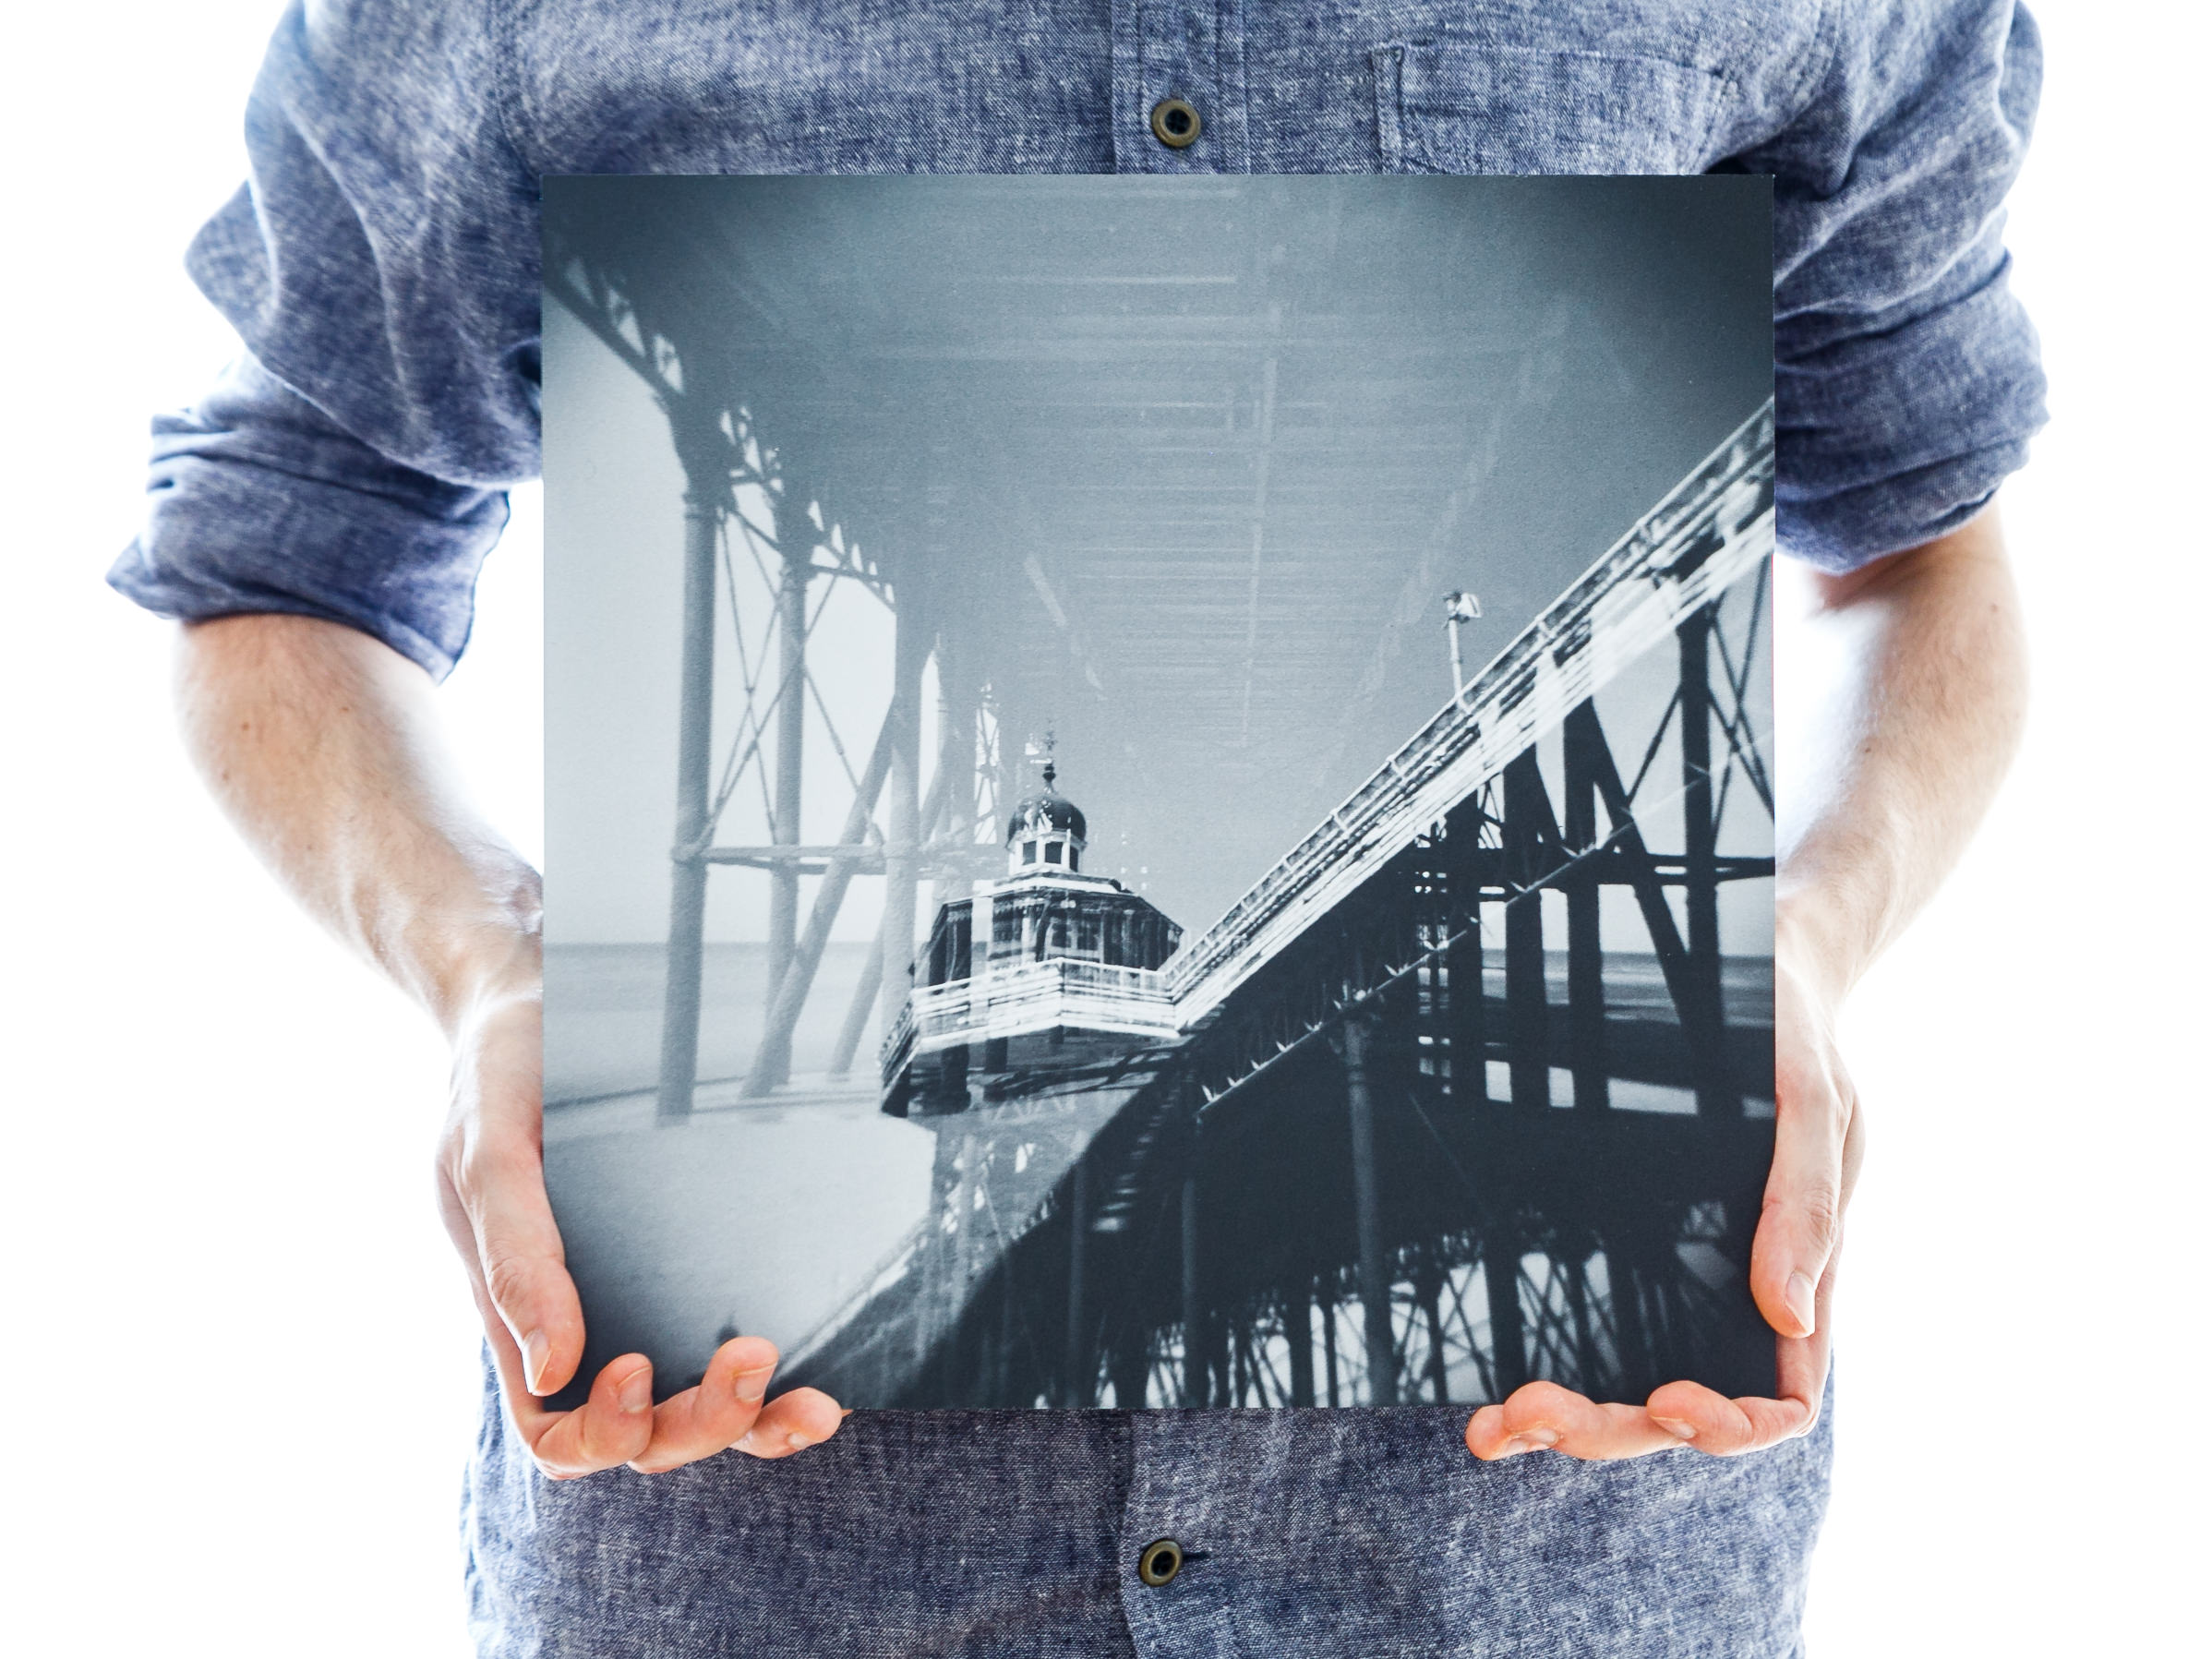 'North Pier' (30x30cm - £45)